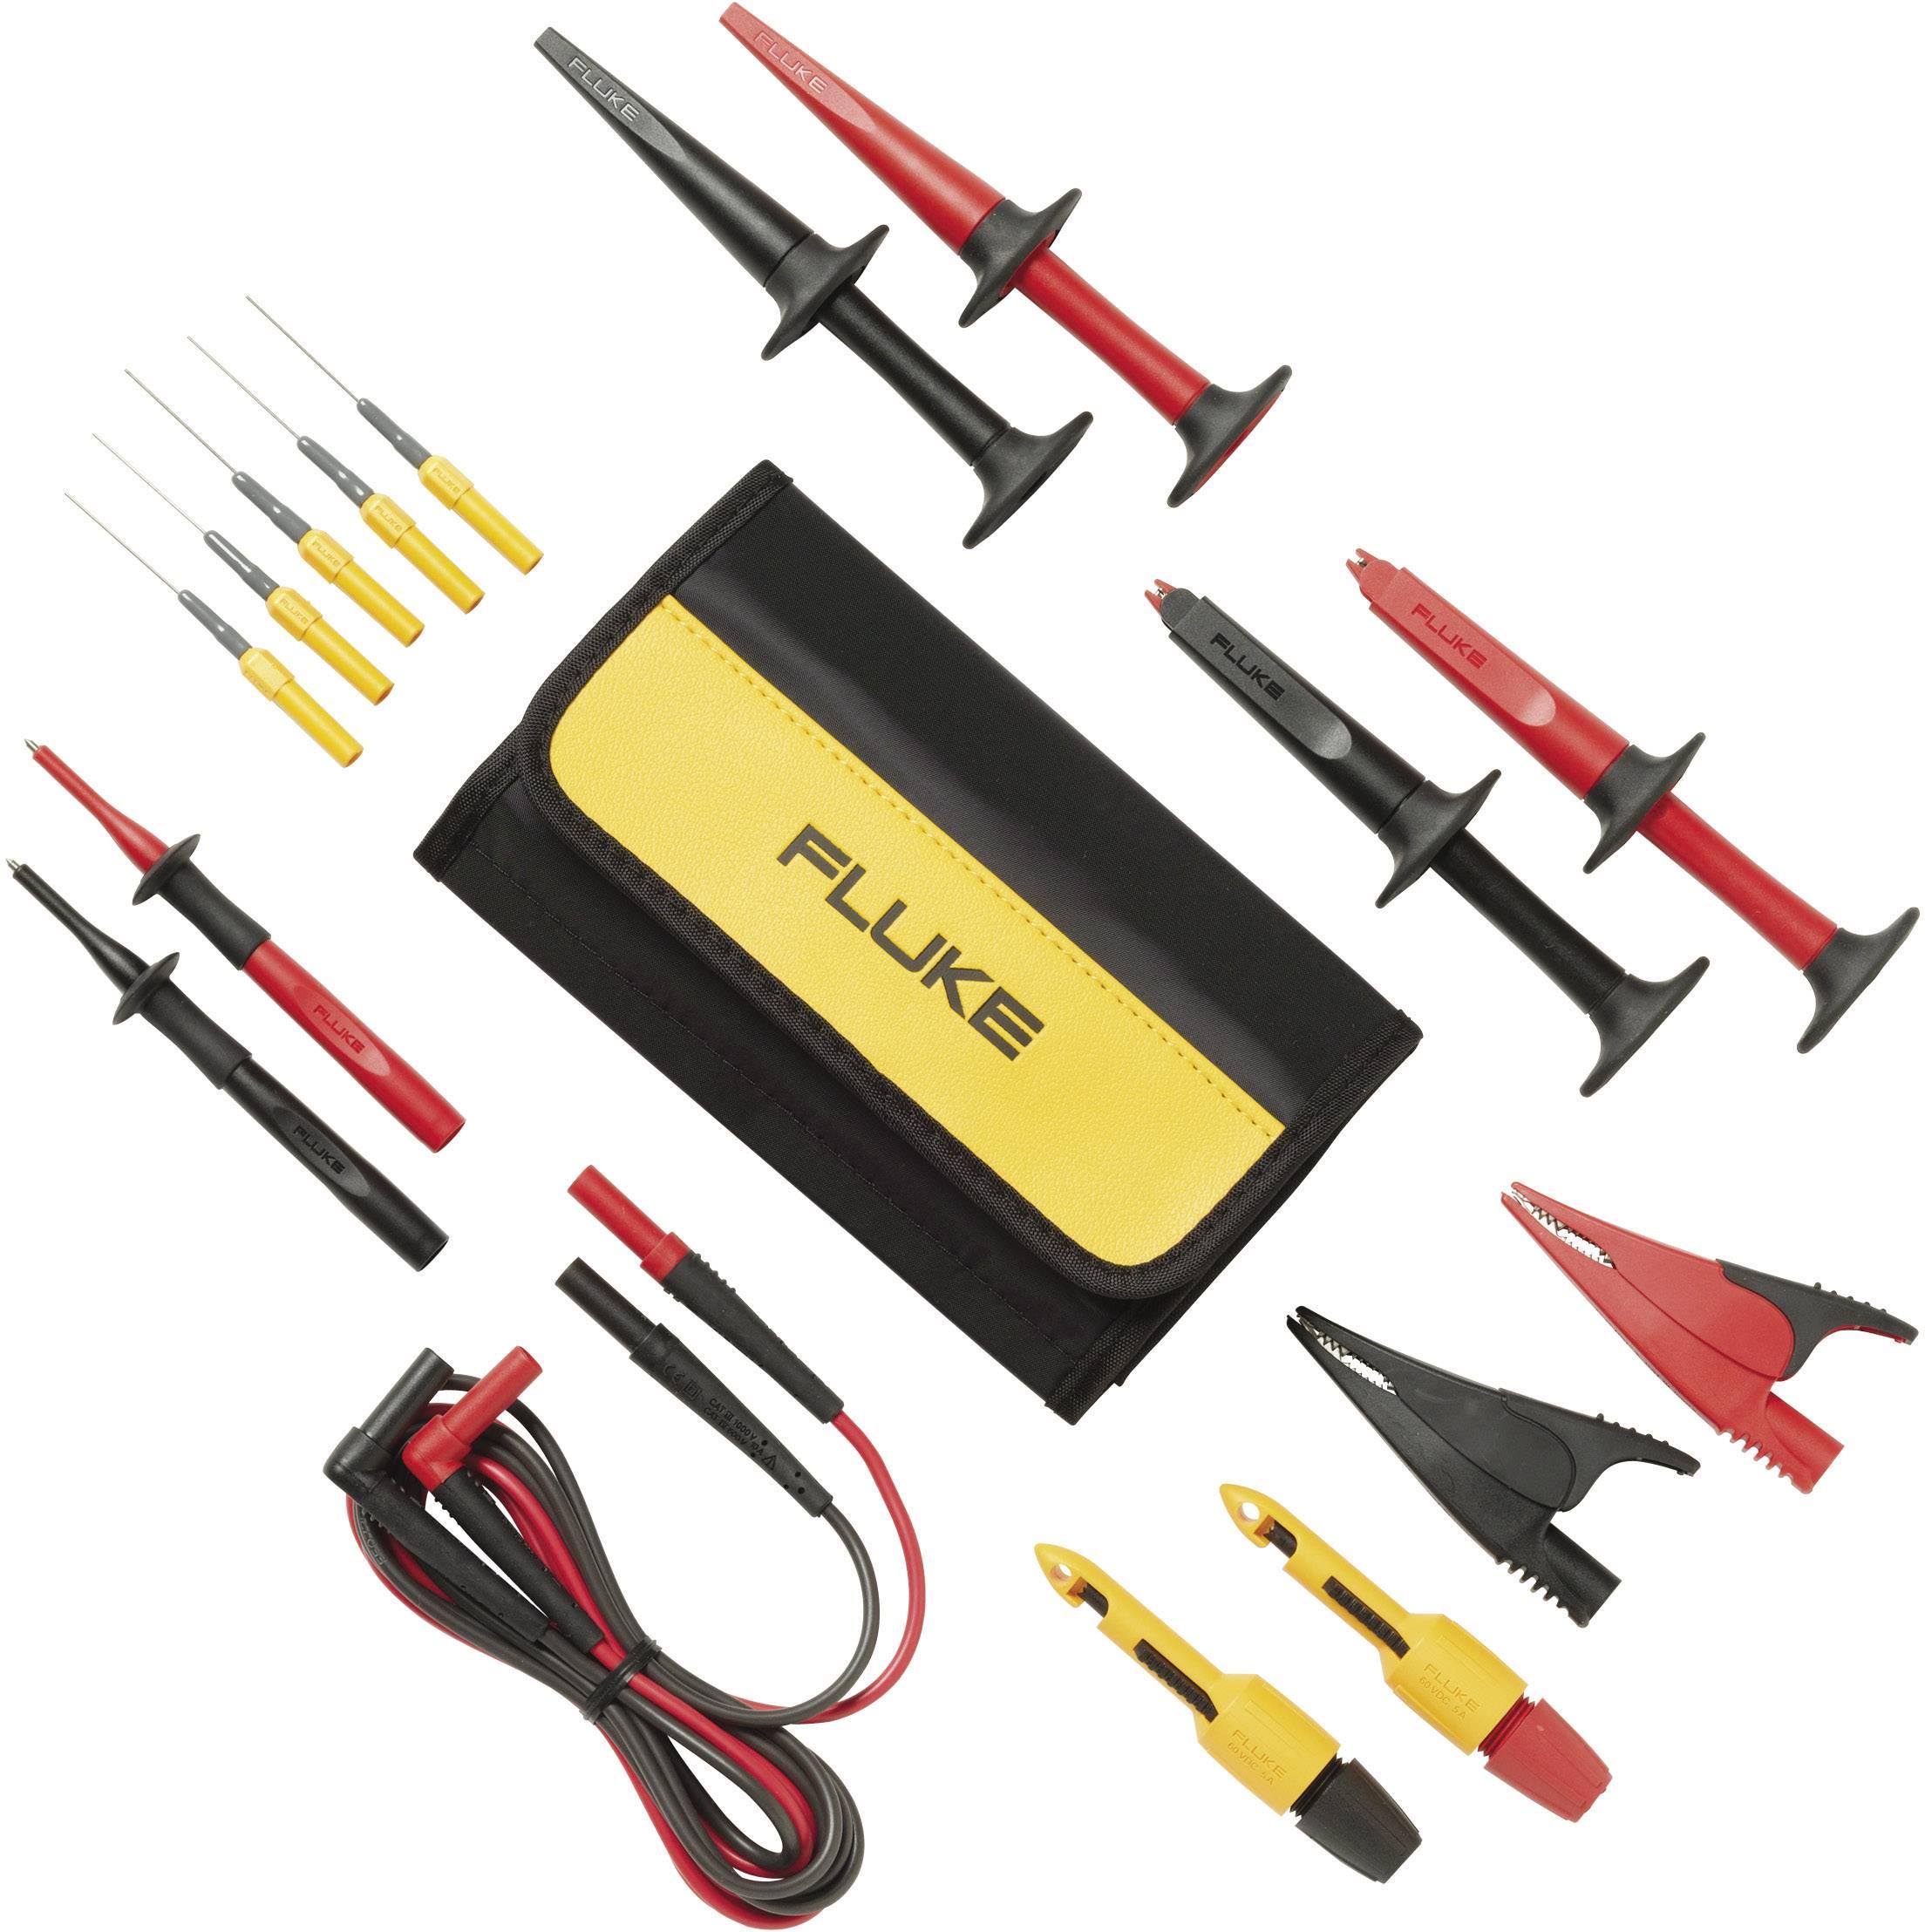 Sada meracích káblov Fluke TLK 282-1 Deluxe KFZ